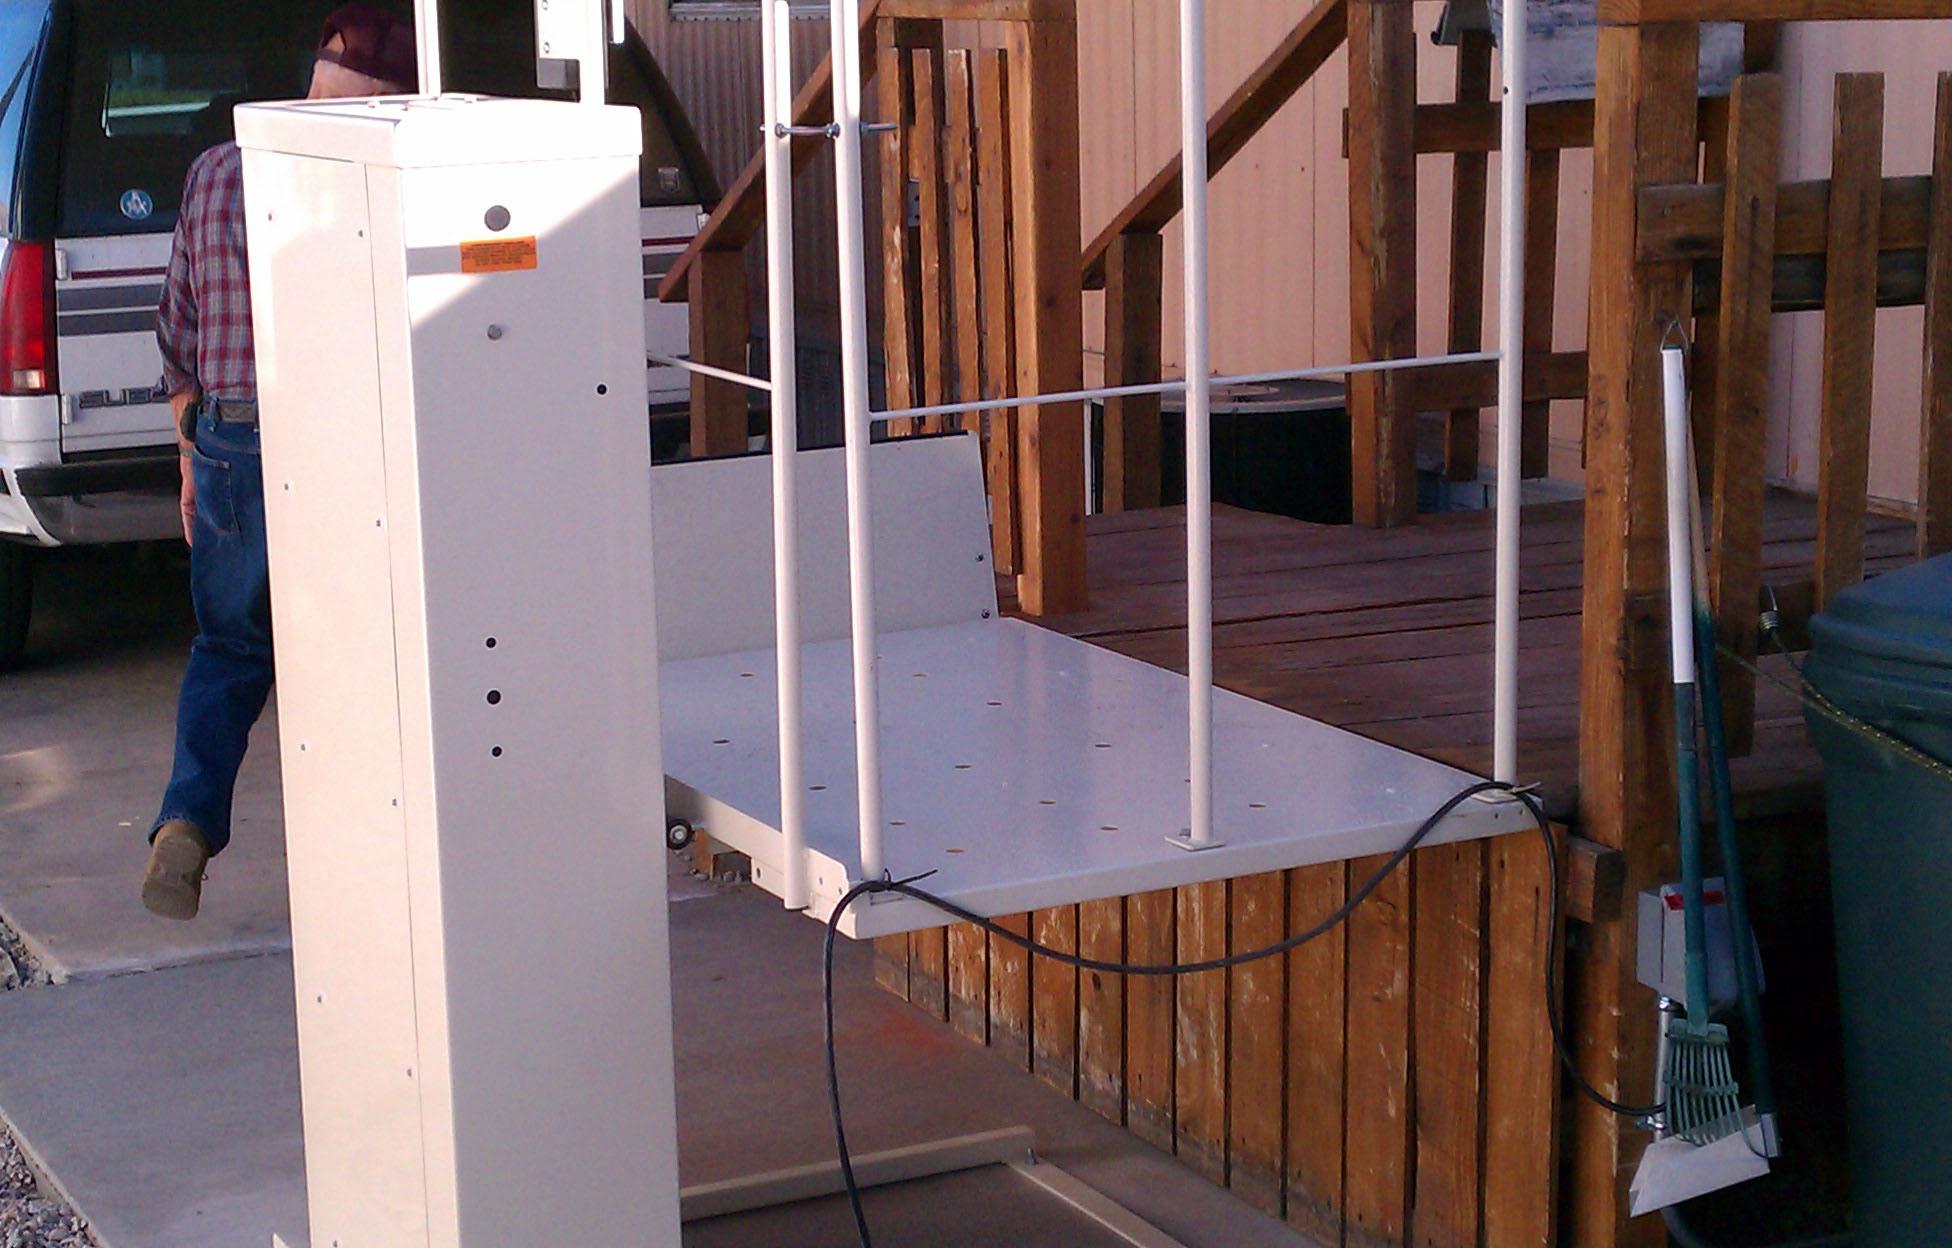 access industries porch lift wiring diagram 2001 chevrolet malibu radio lifts chermac builders